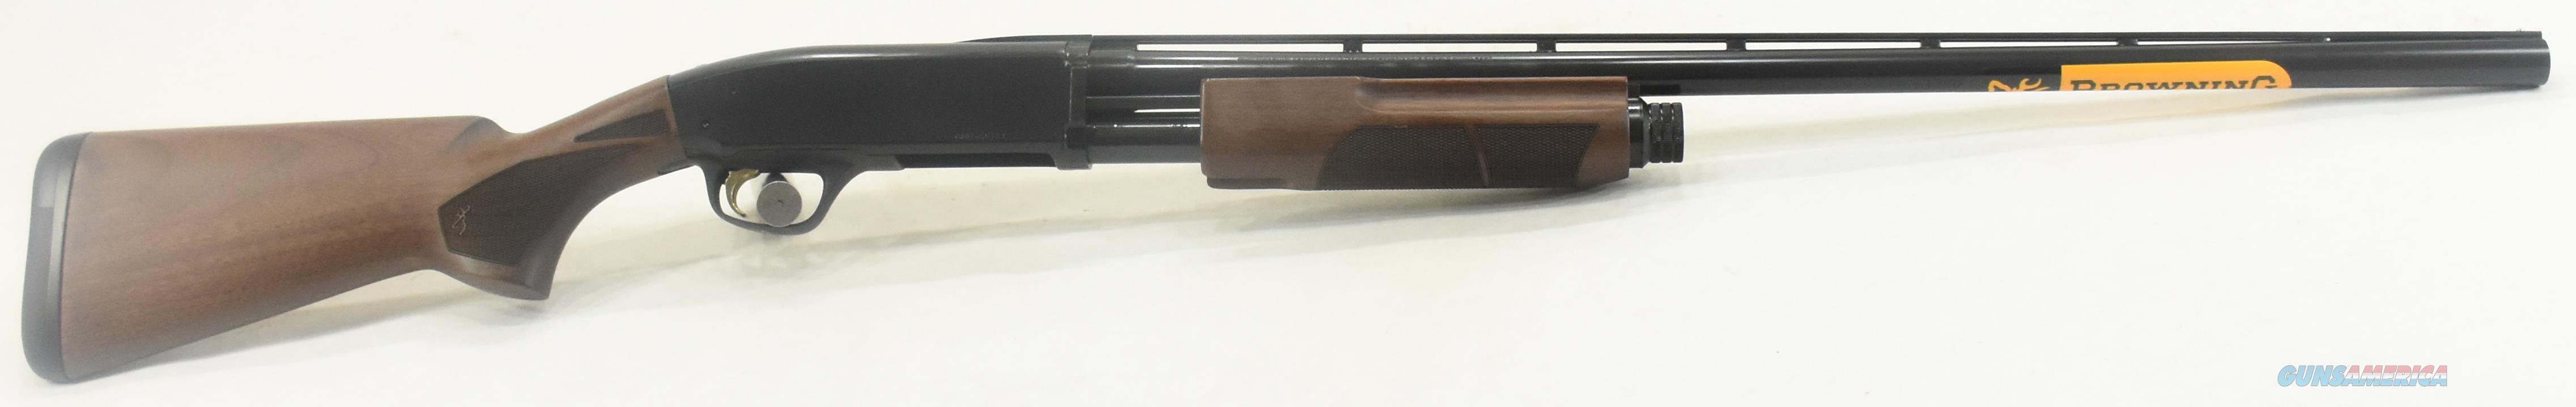 BPS Field Walnut 12Ga 28-3In 012286304012286304  Guns > Shotguns > Browning Shotguns > Pump Action > Hunting